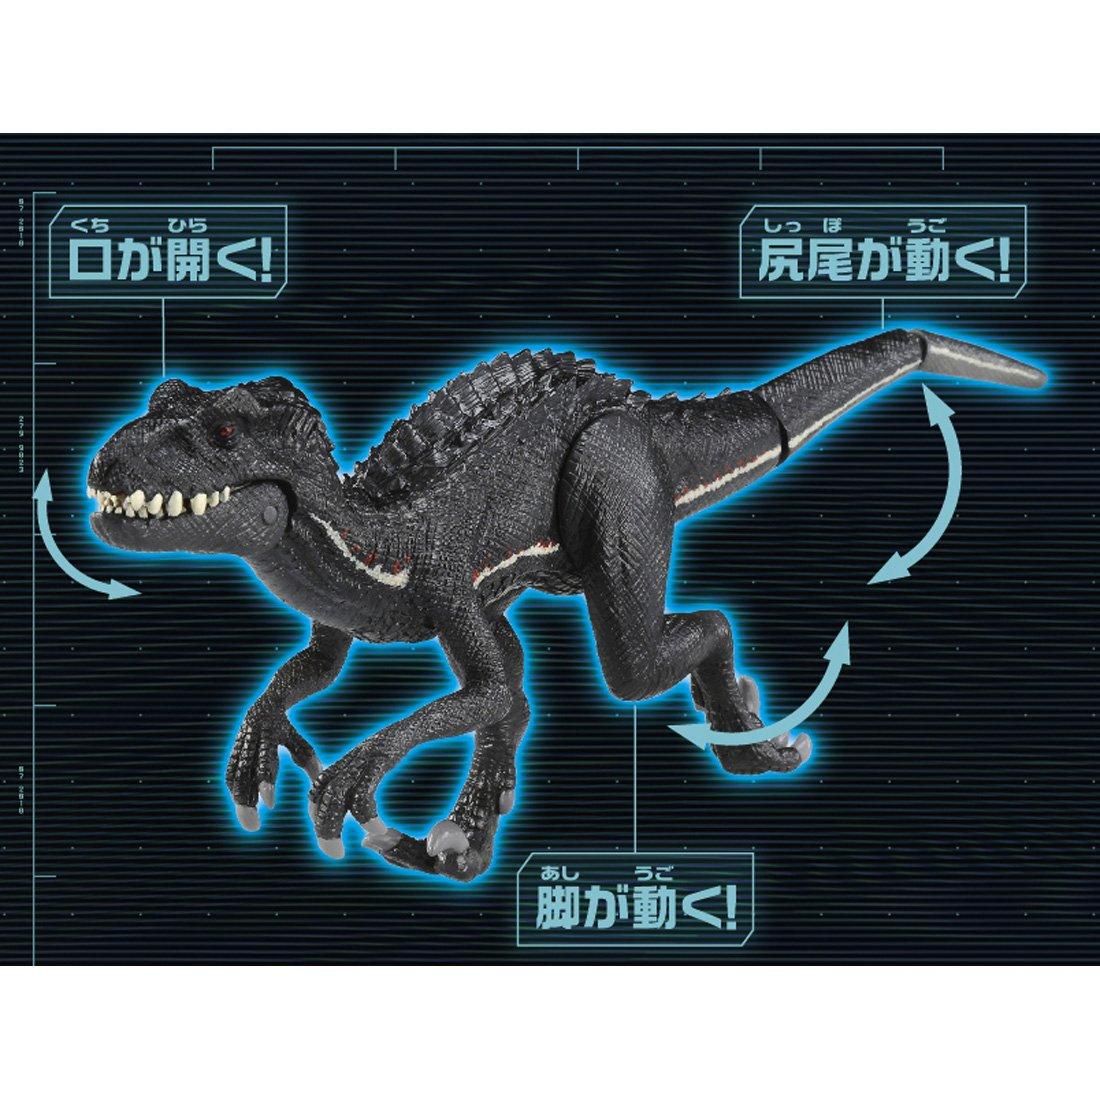 TOMY動物模型 混血恐龍